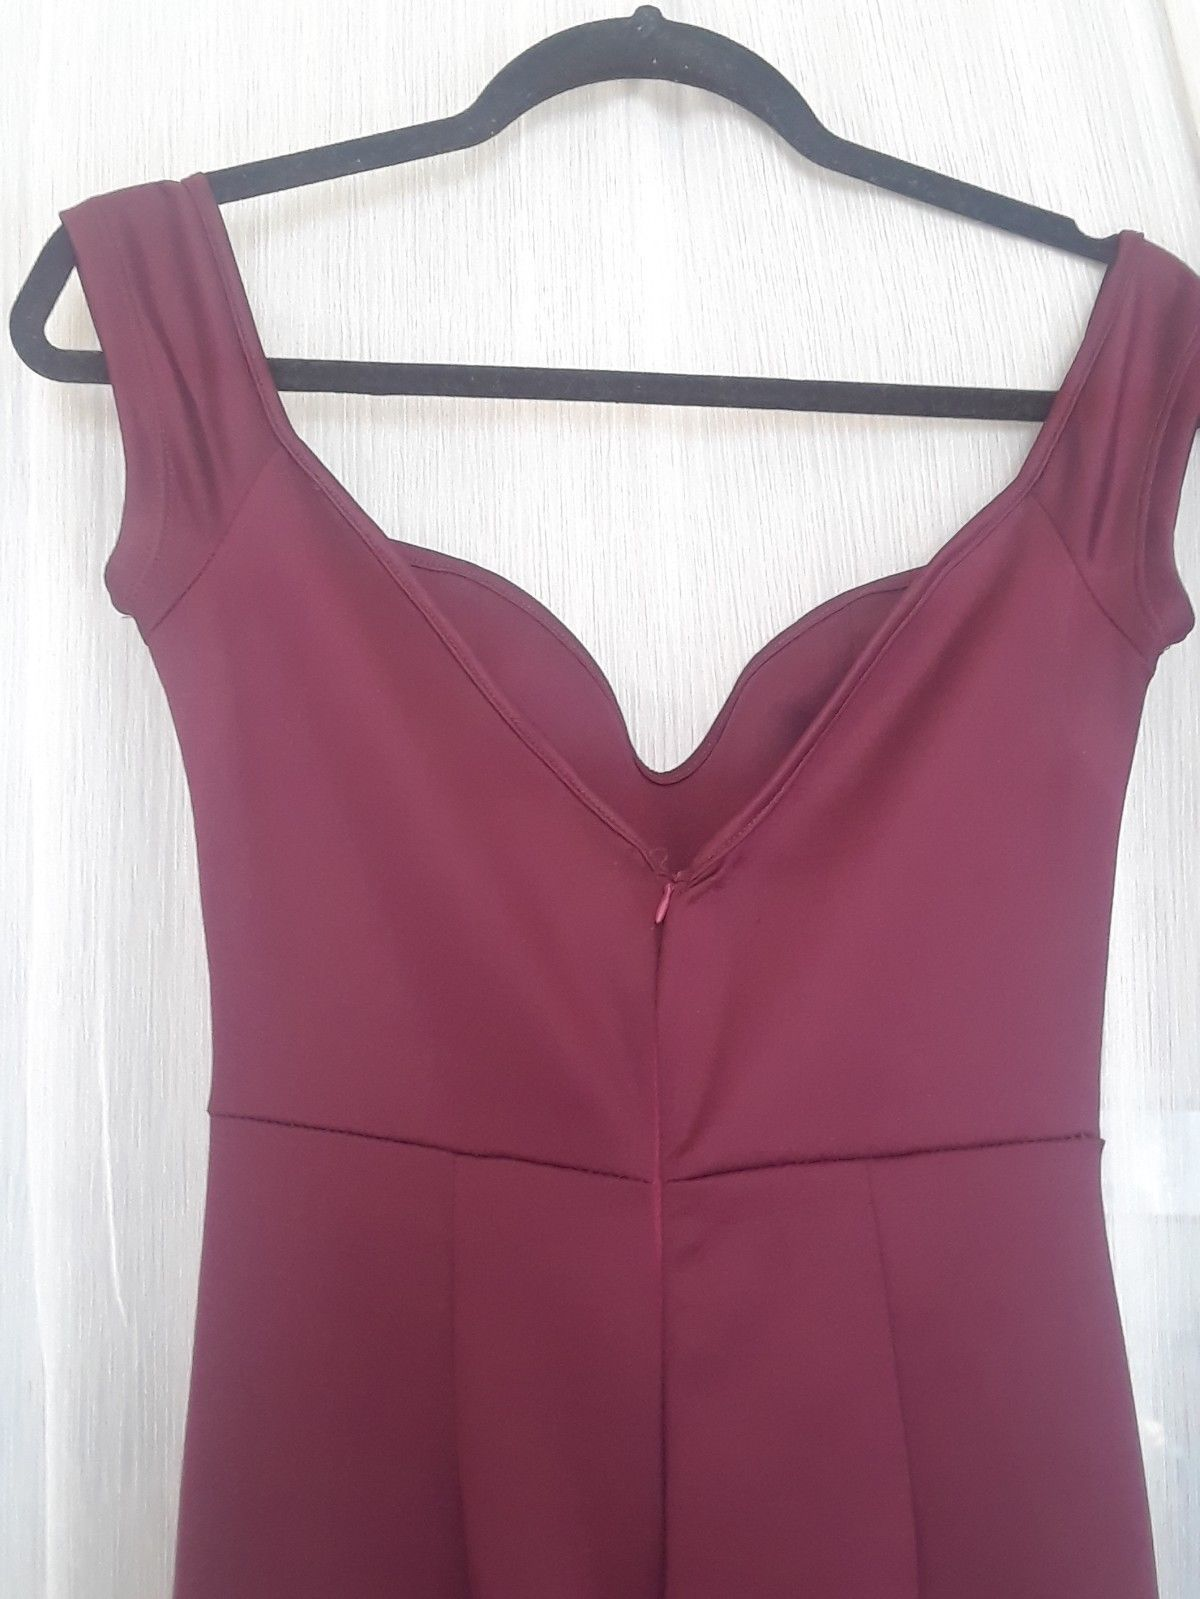 Maroonwine red mermaid body highlow offshoulder formal gowndress